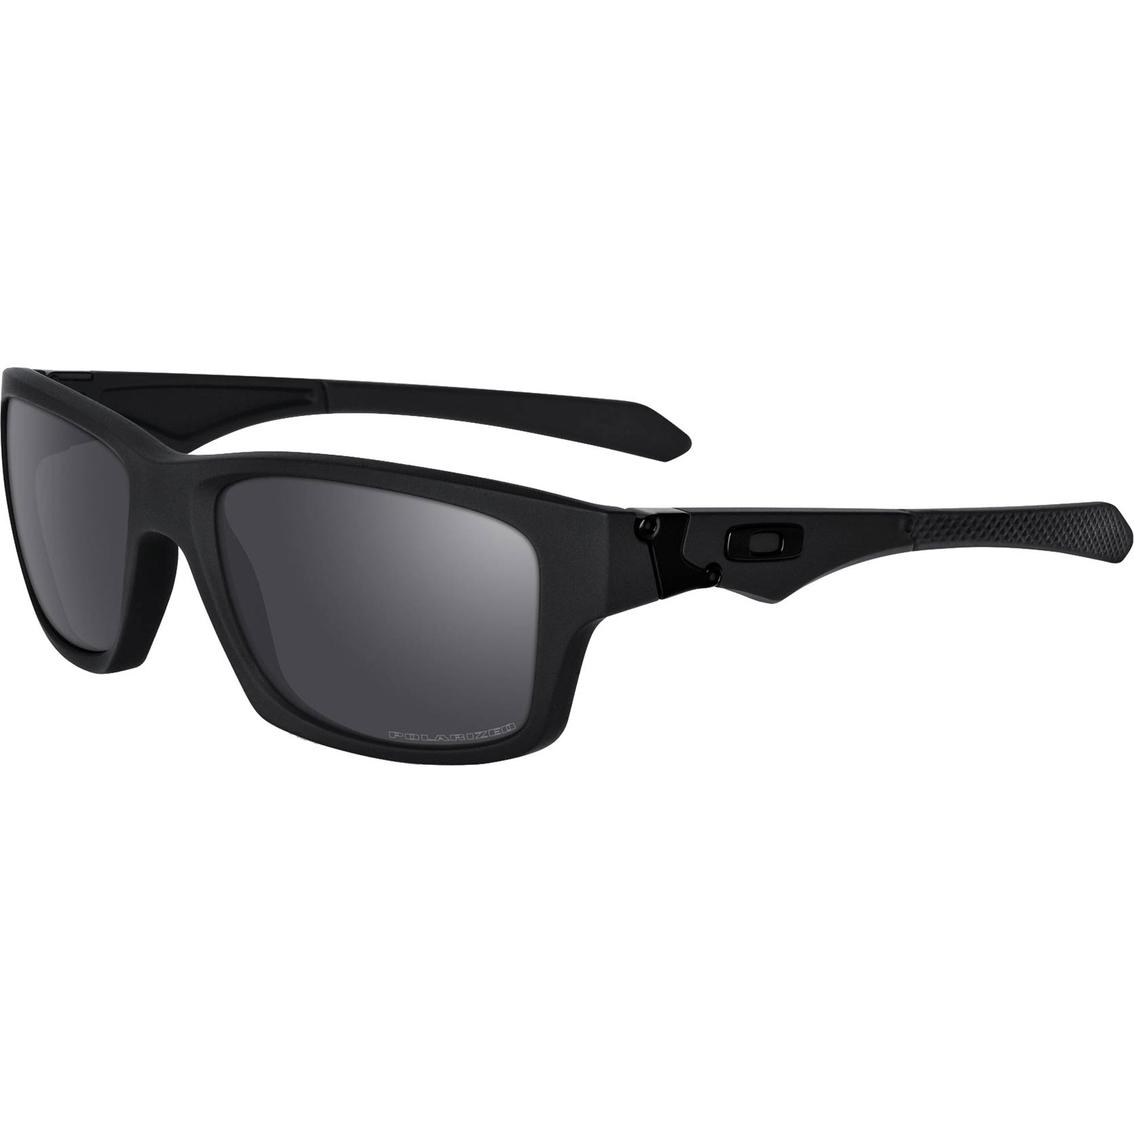 477847ba70494 Oakley Jupiter Squared Sunglasses Oo9135-01